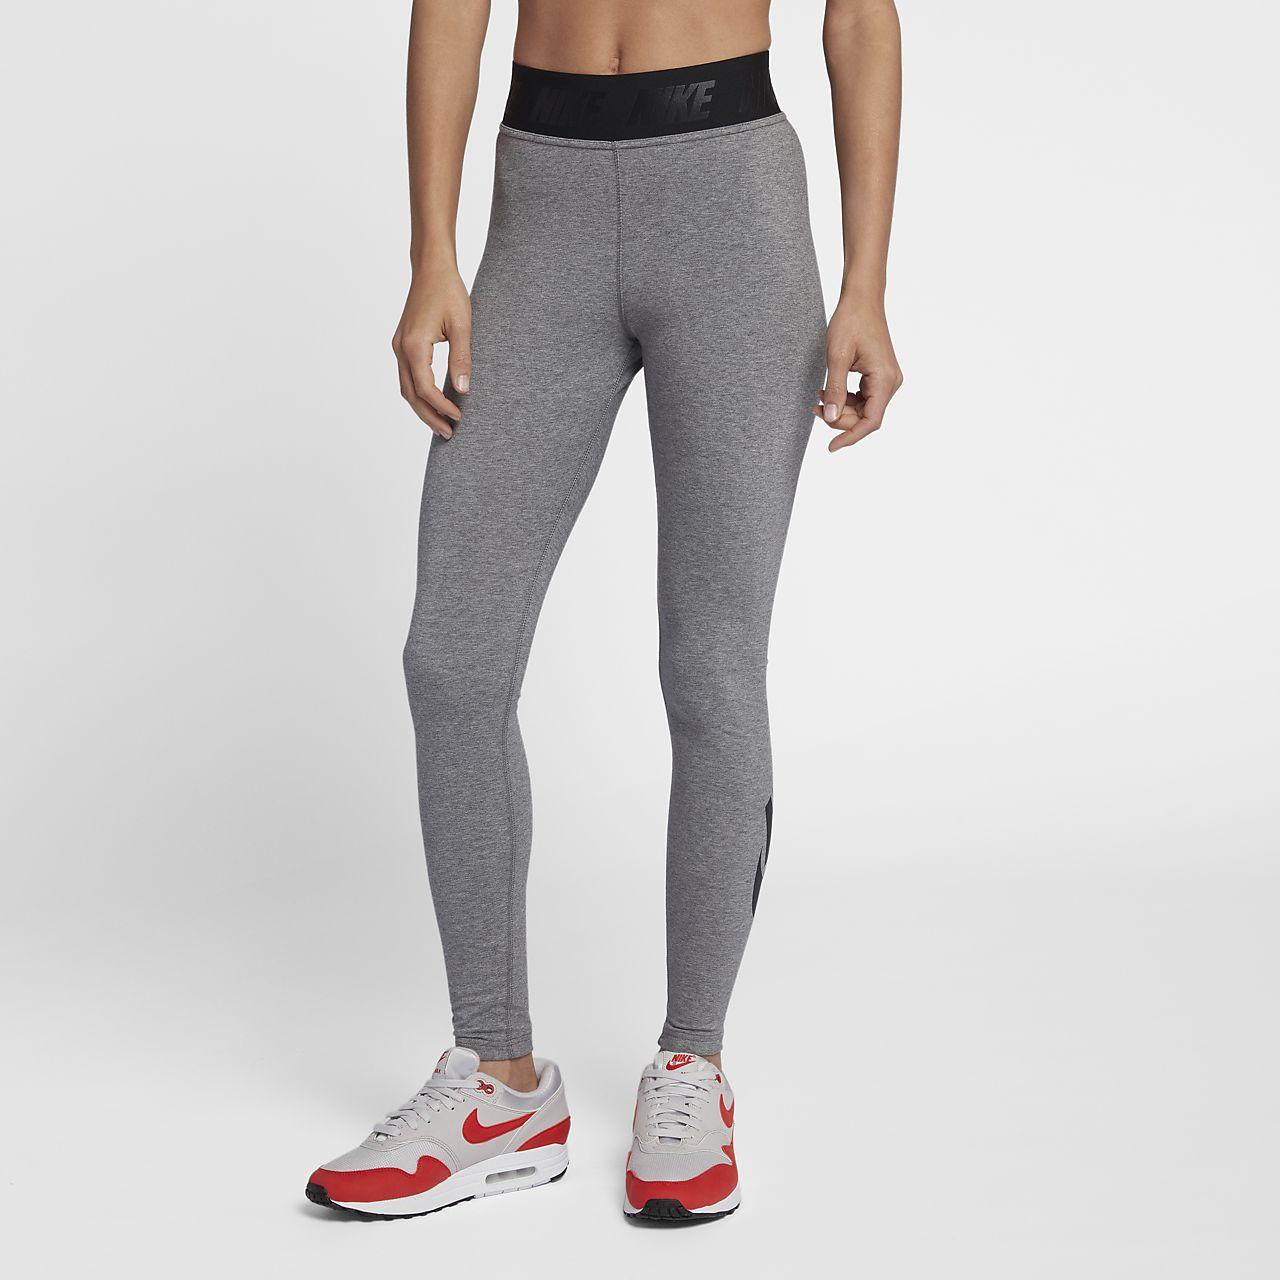 4f781d5c8ae92 Nike Sportswear Leg-A-See Women's High-Rise Leggings. Nike.com NO